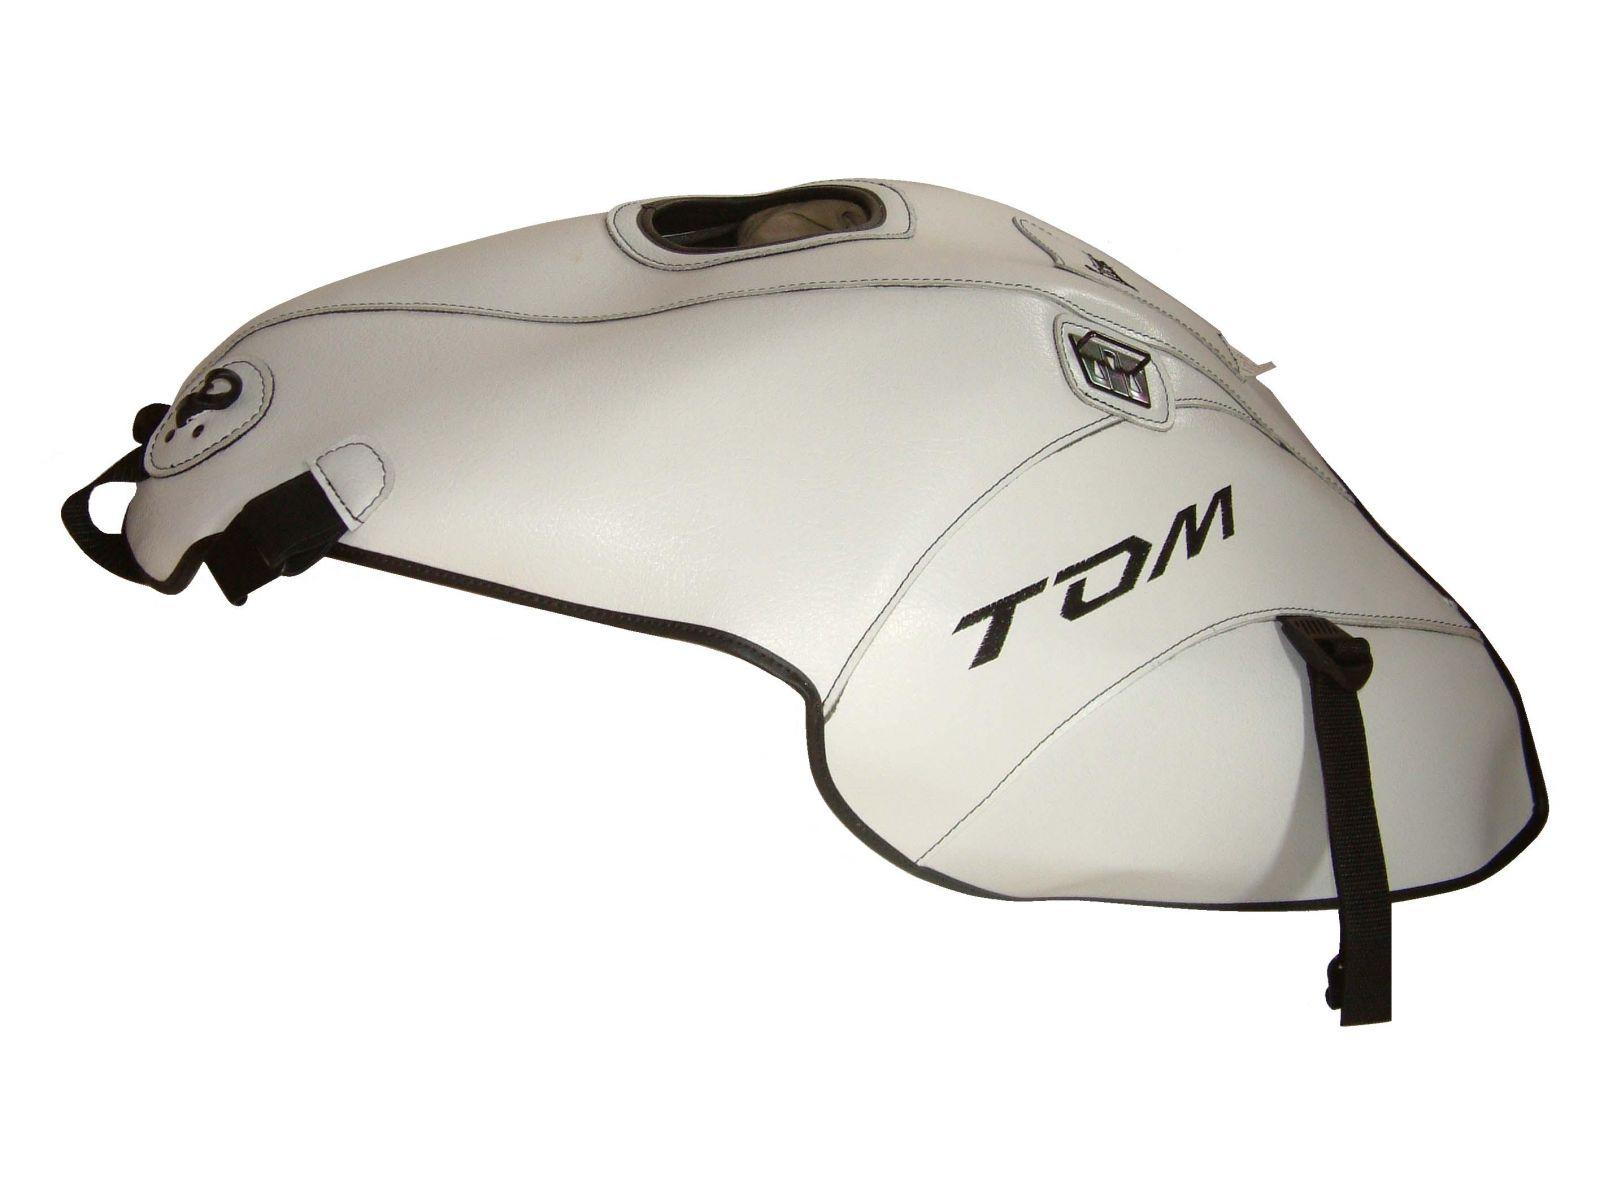 Capa de depósito TPR4975 - YAMAHA TDM 900 ABS